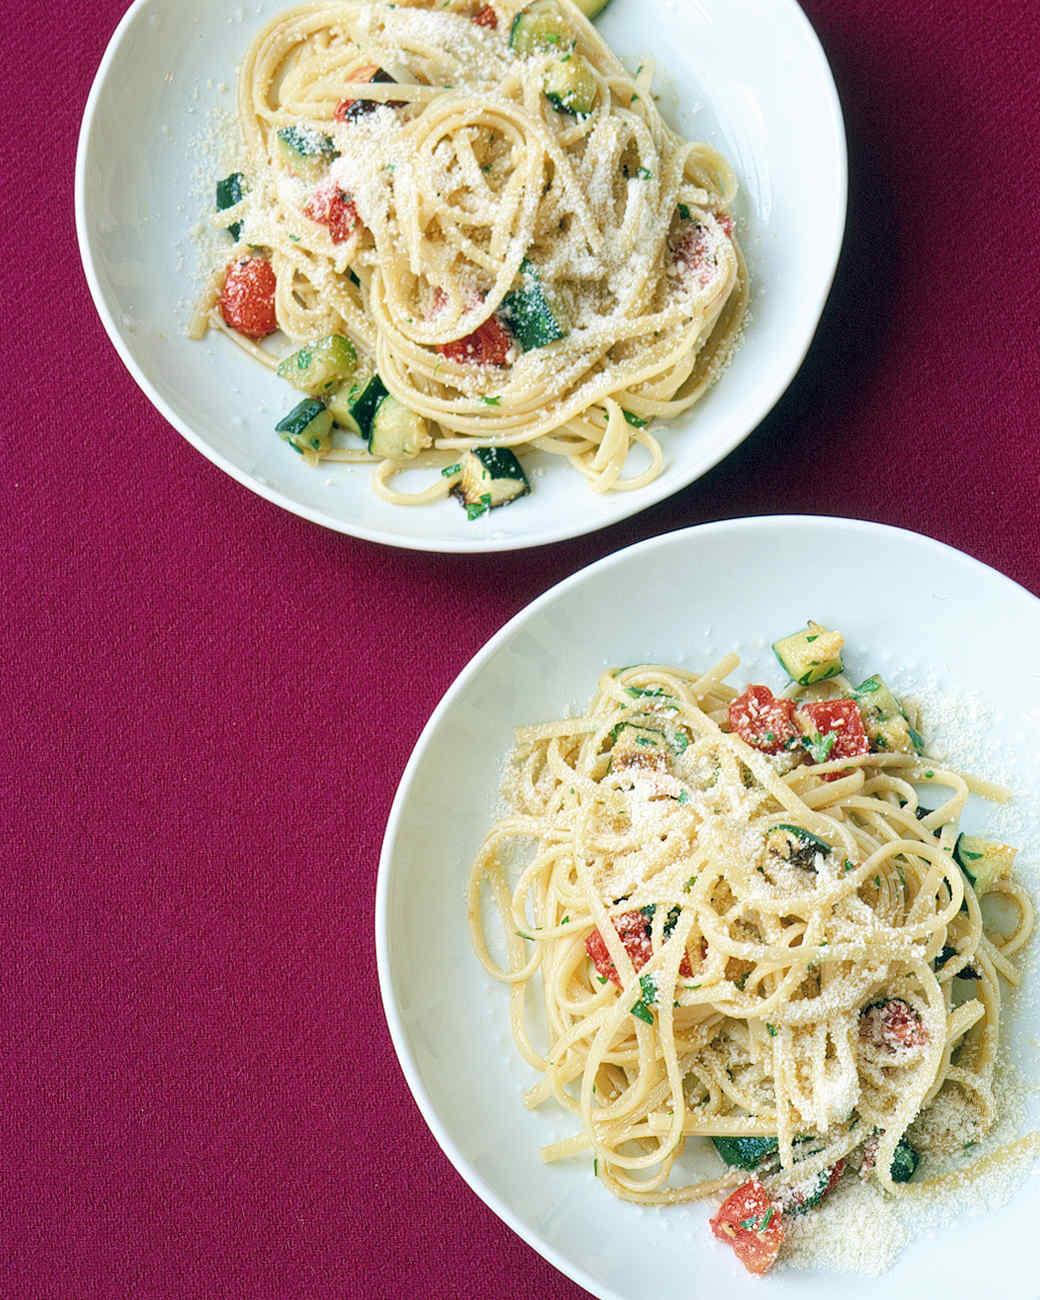 Roasted Zucchini and Tomato Pasta